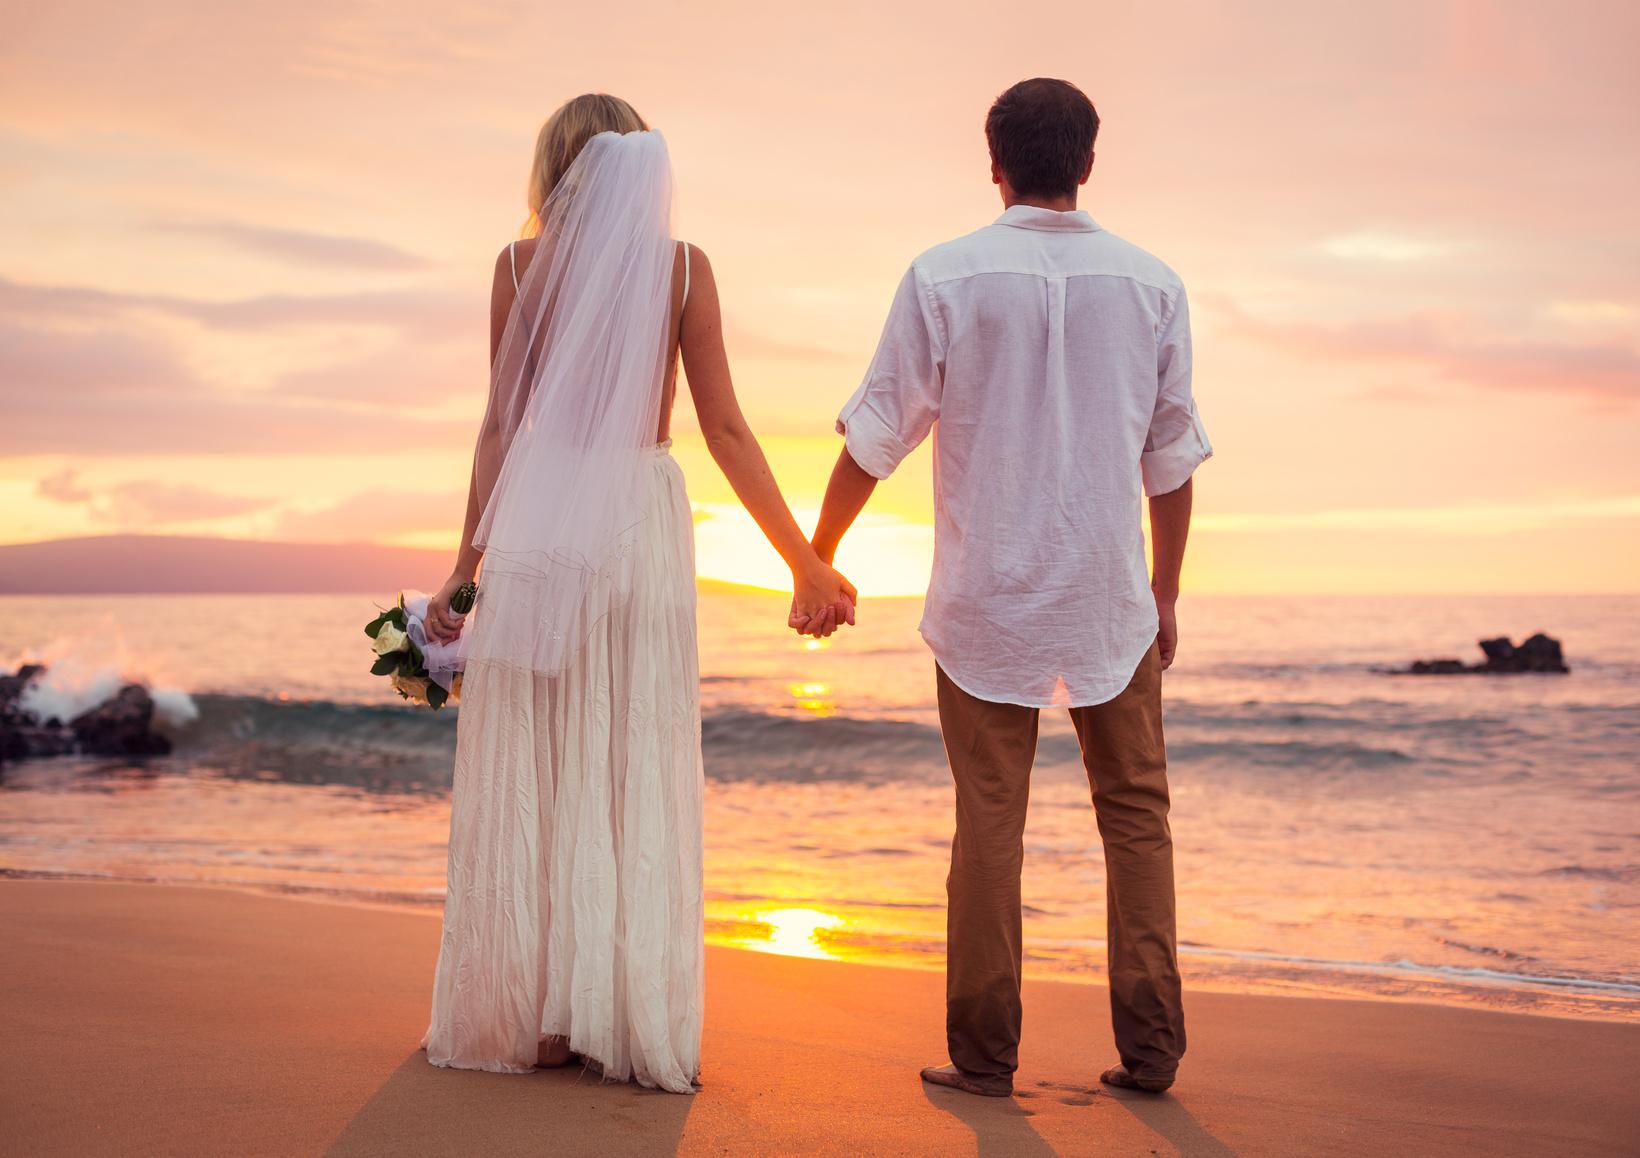 agenzia matrimoniale brasile video sexi luna